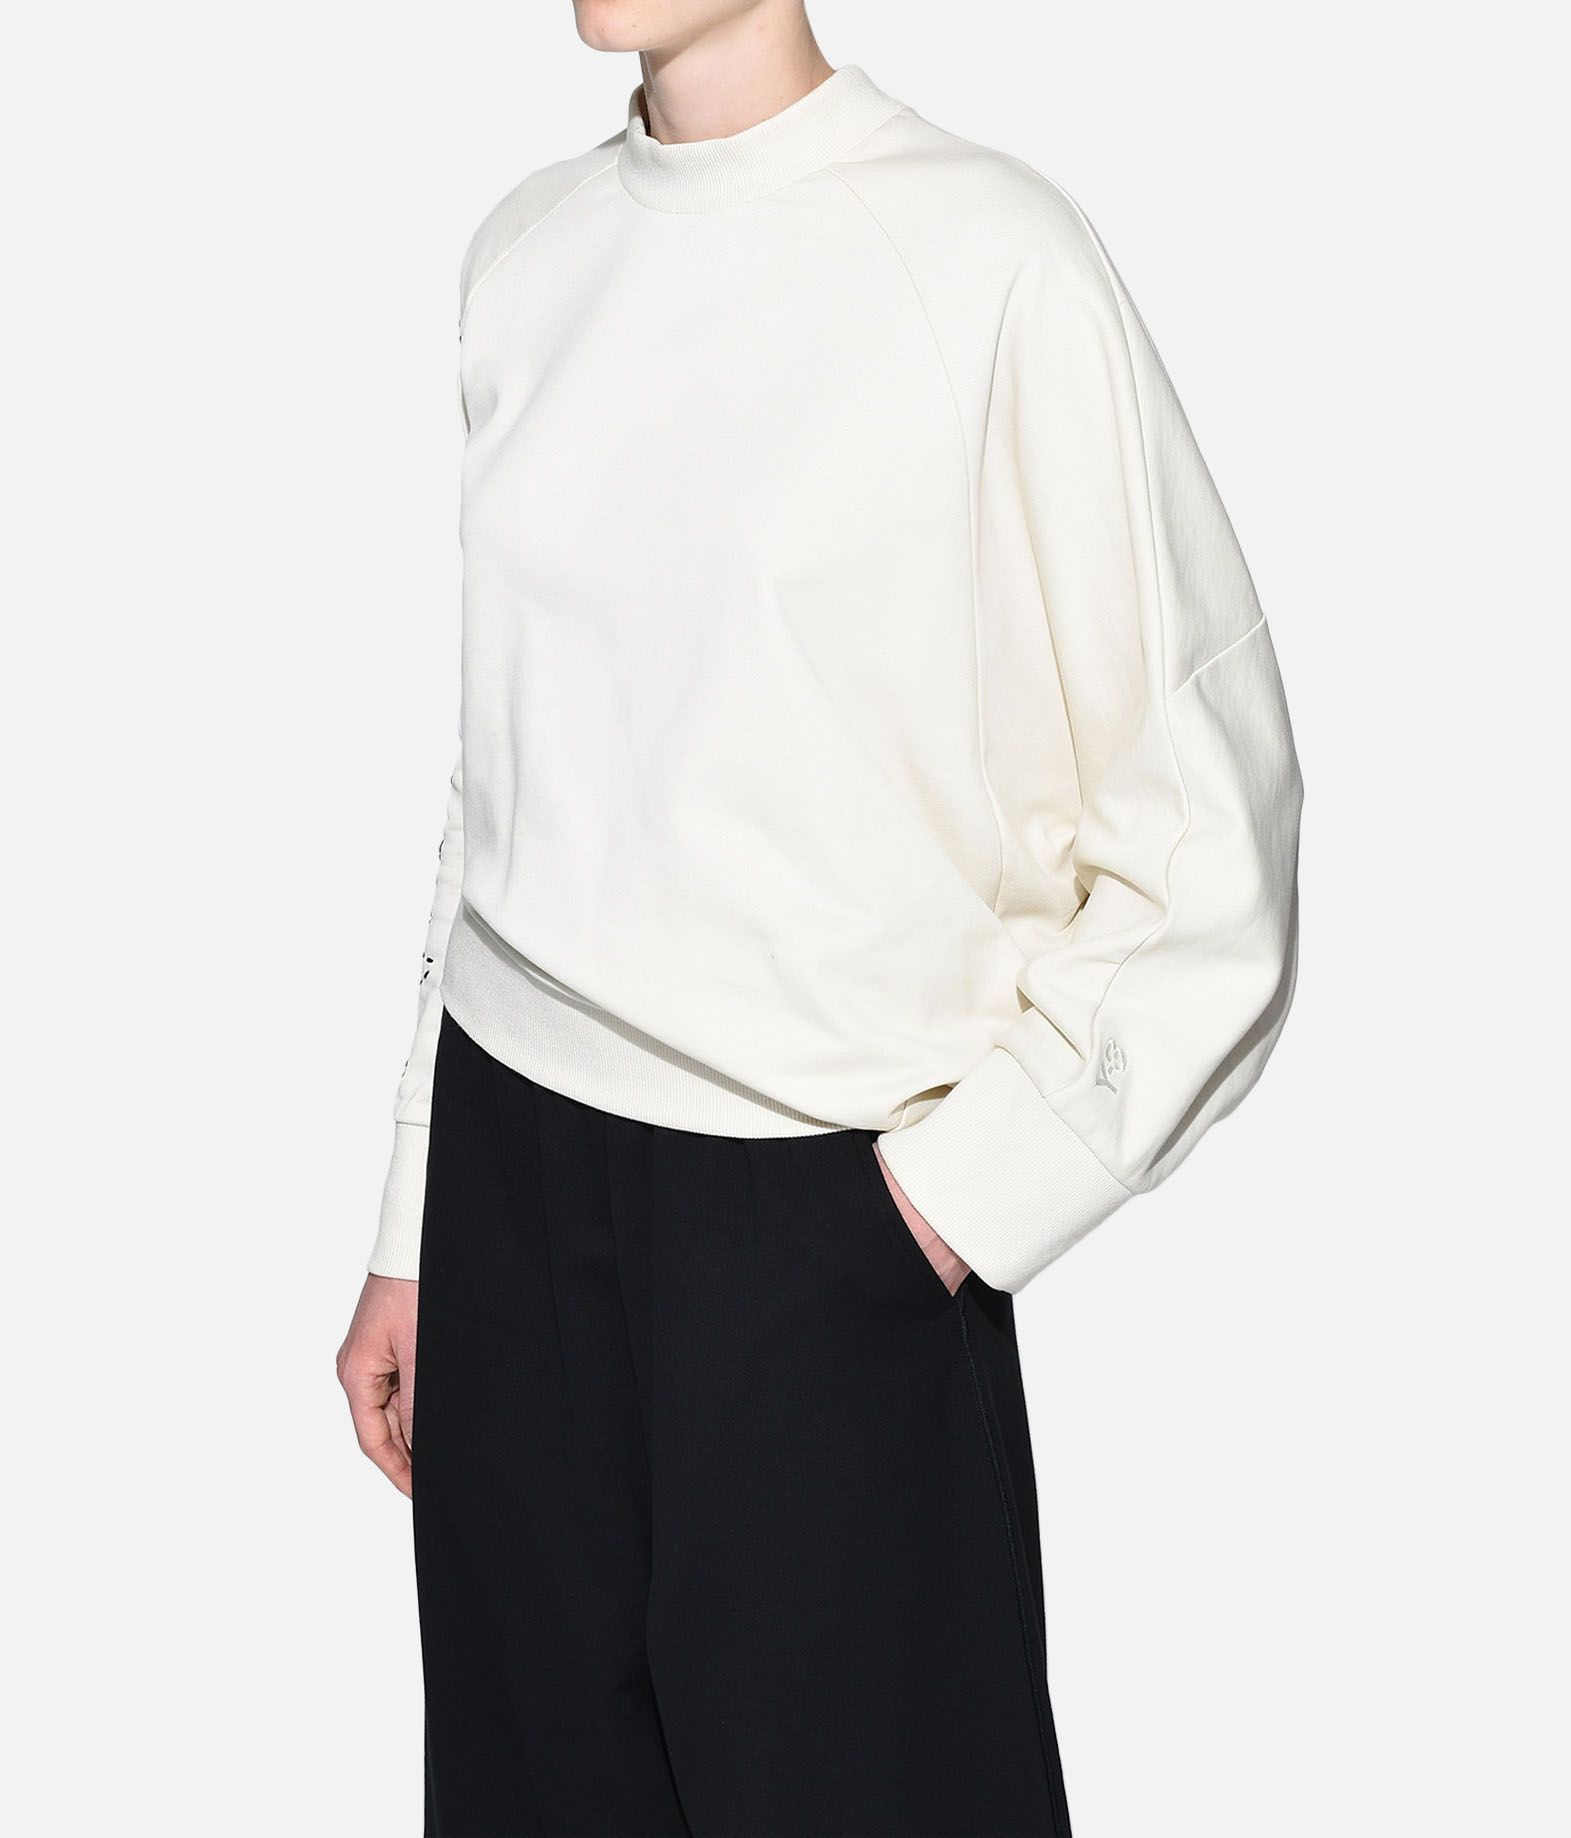 Y-3 Y-3 Sashiko Slogan Sweater Толстовка Для Женщин e